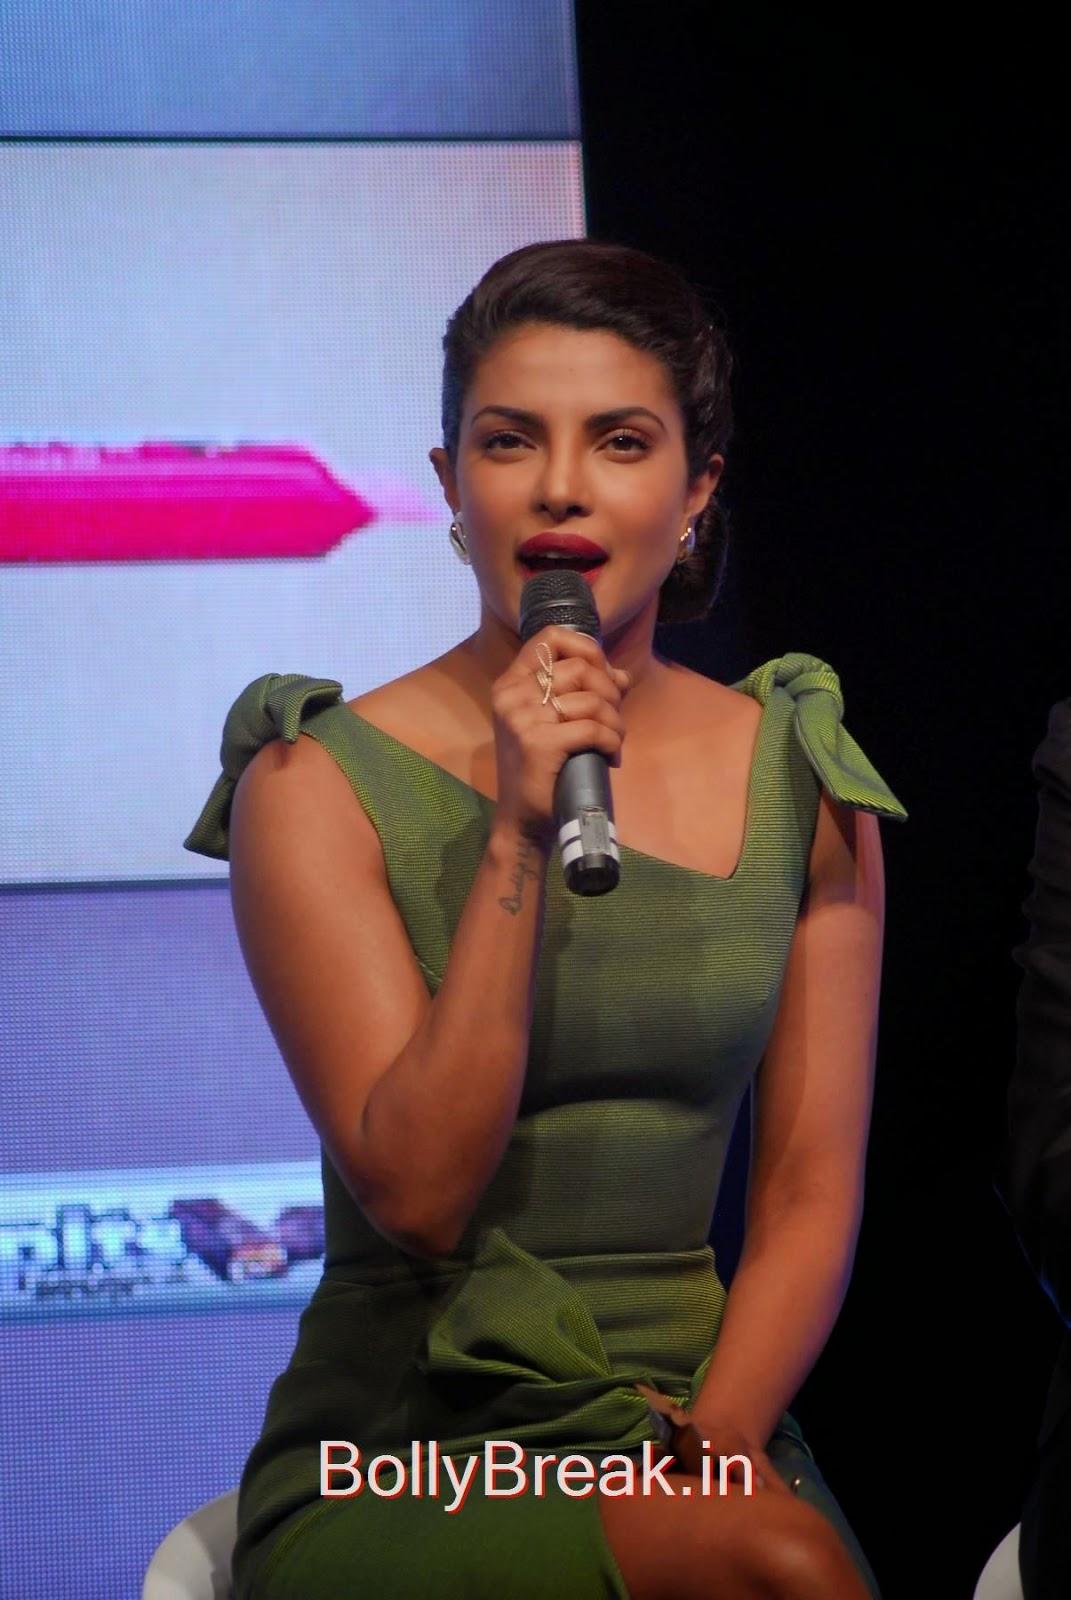 Hindi Actress Priyanka Chopra, Priyanka Chopra Hot Pics in green dress from Hoppit Chocolate Launch